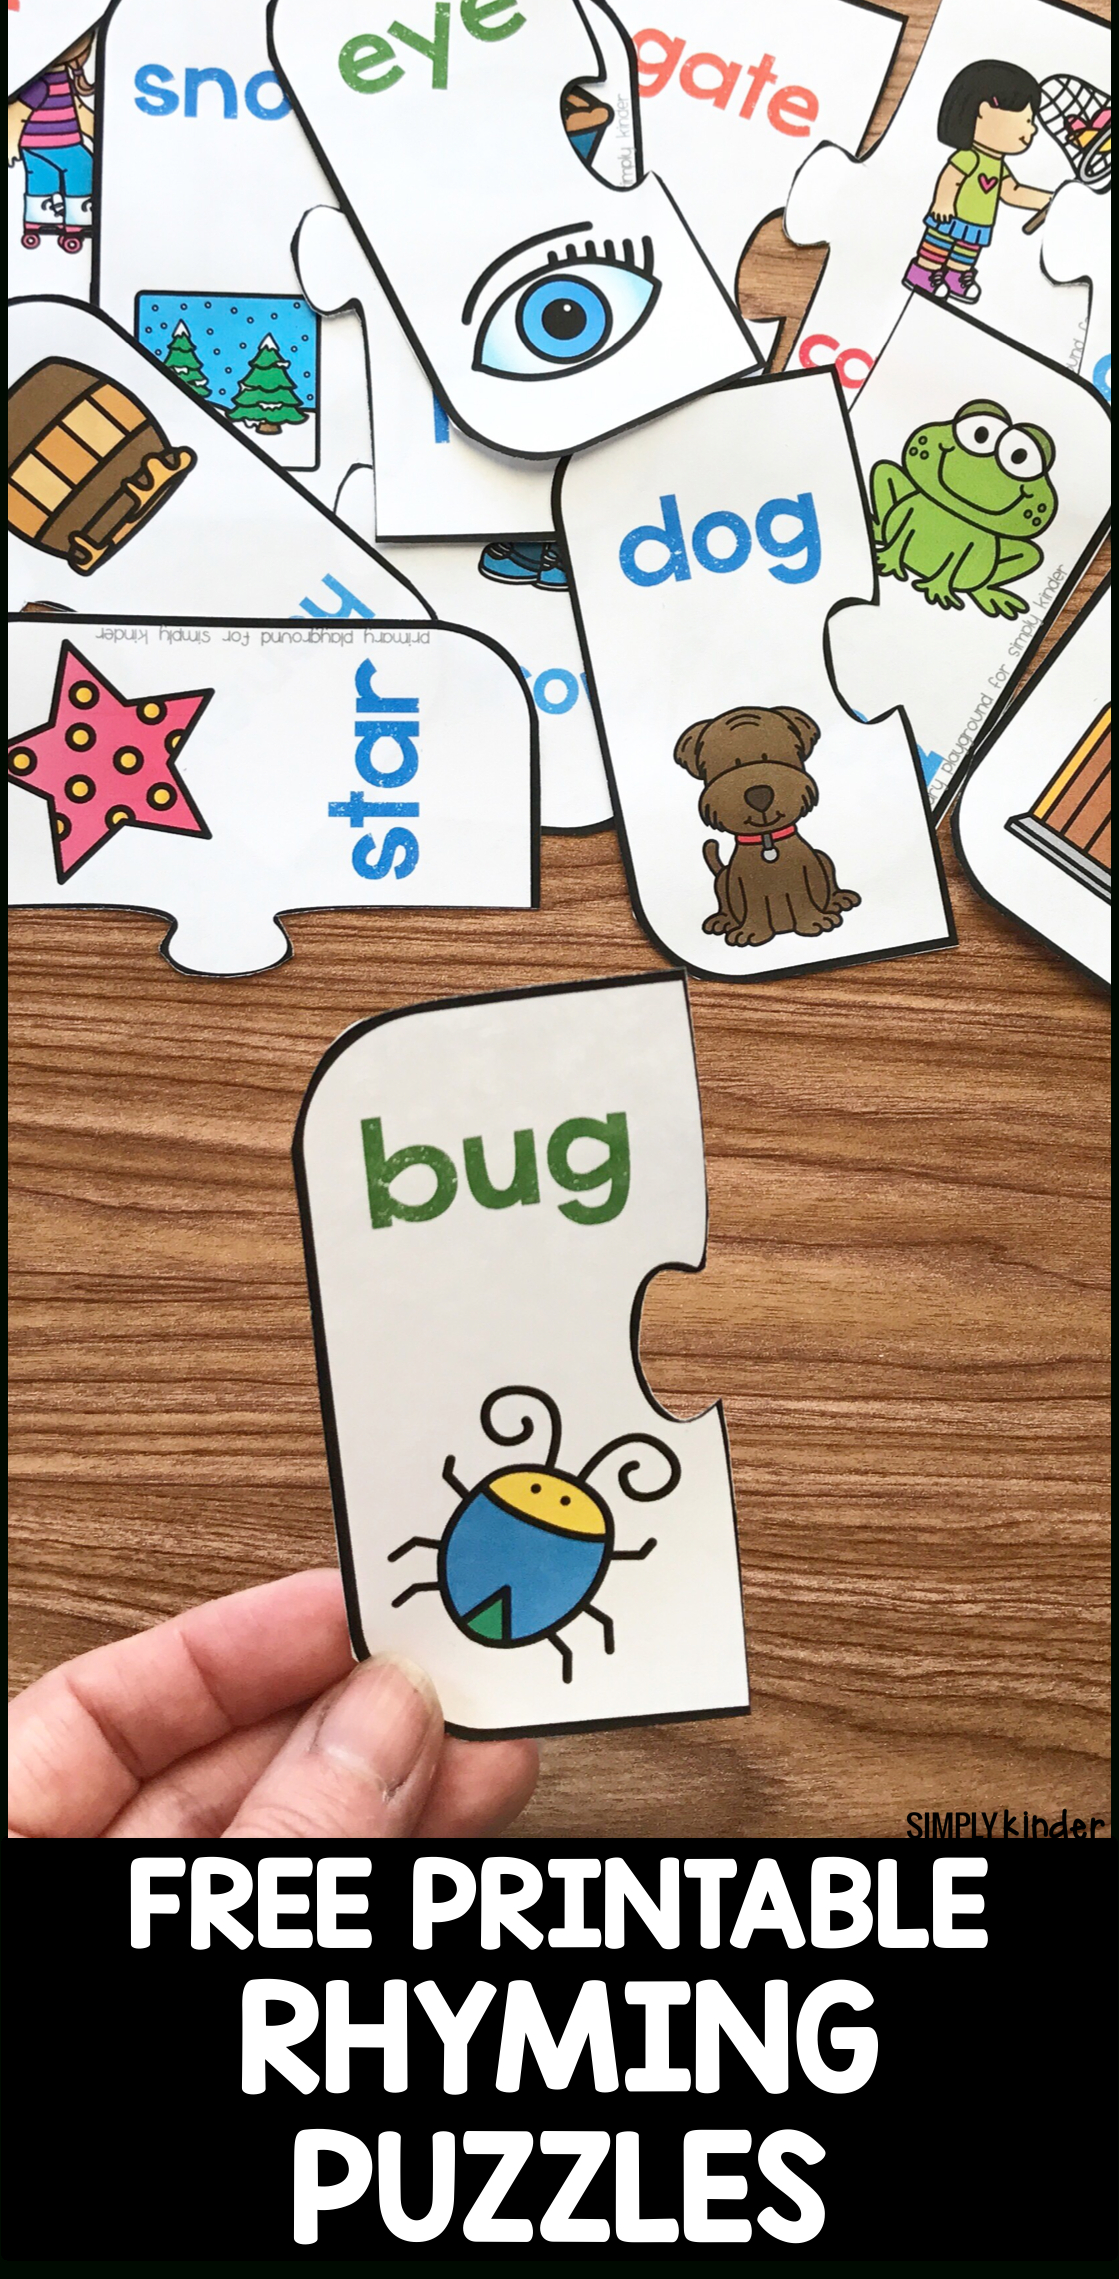 Free Printable Rhyming Puzzles - Simply Kinder - Free Printable Rhyming Activities For Kindergarten